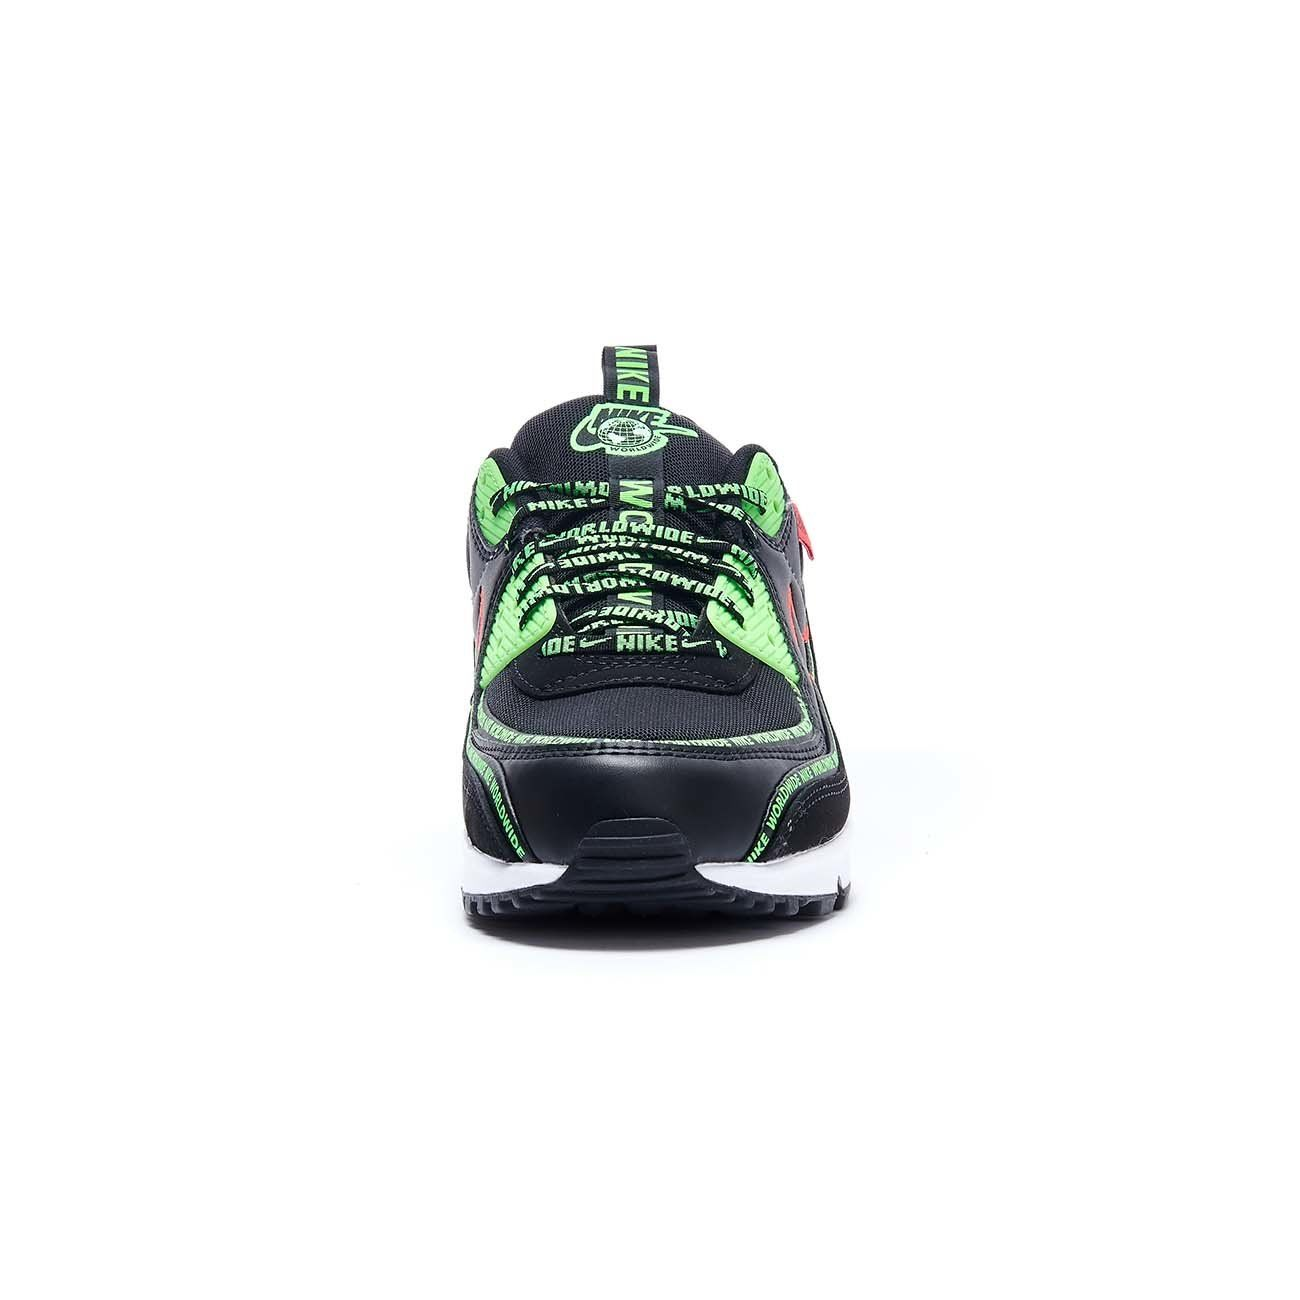 NIKE AIR MAX 90 SE SNEAKERS Man Black Green | Mascheroni Sportswear